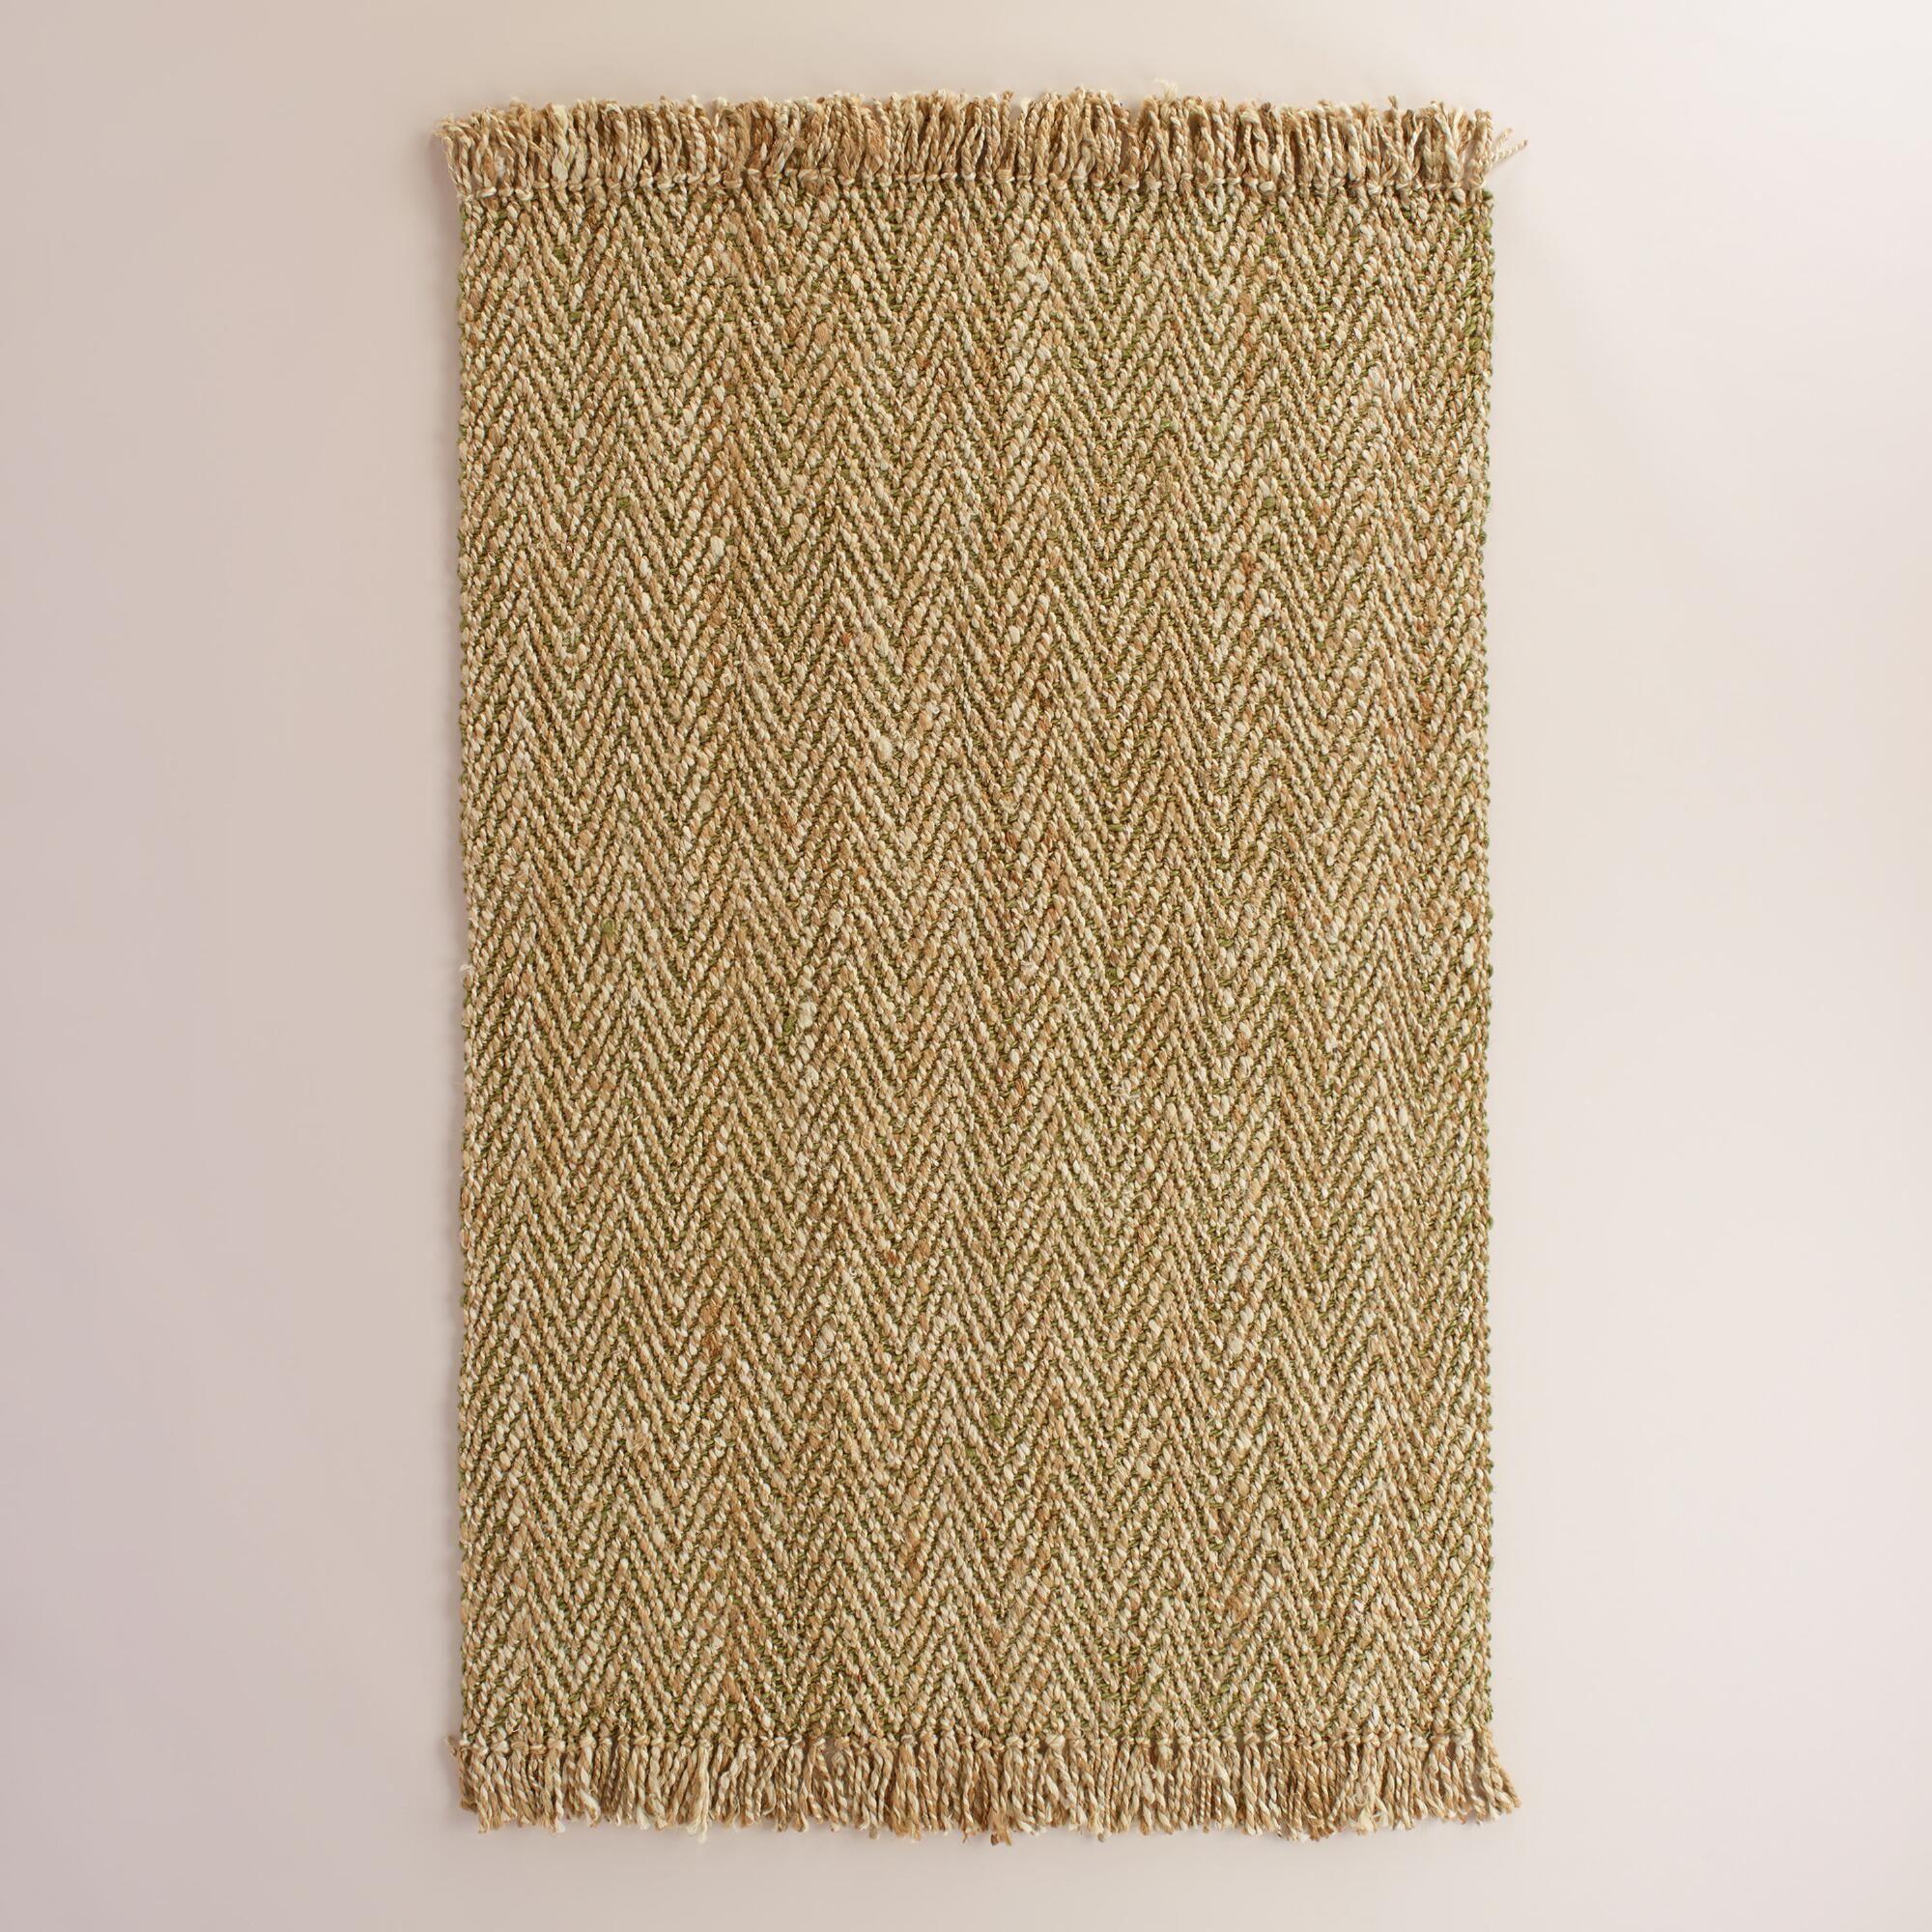 Green Herringbone Weave Jute Area Rug World Market